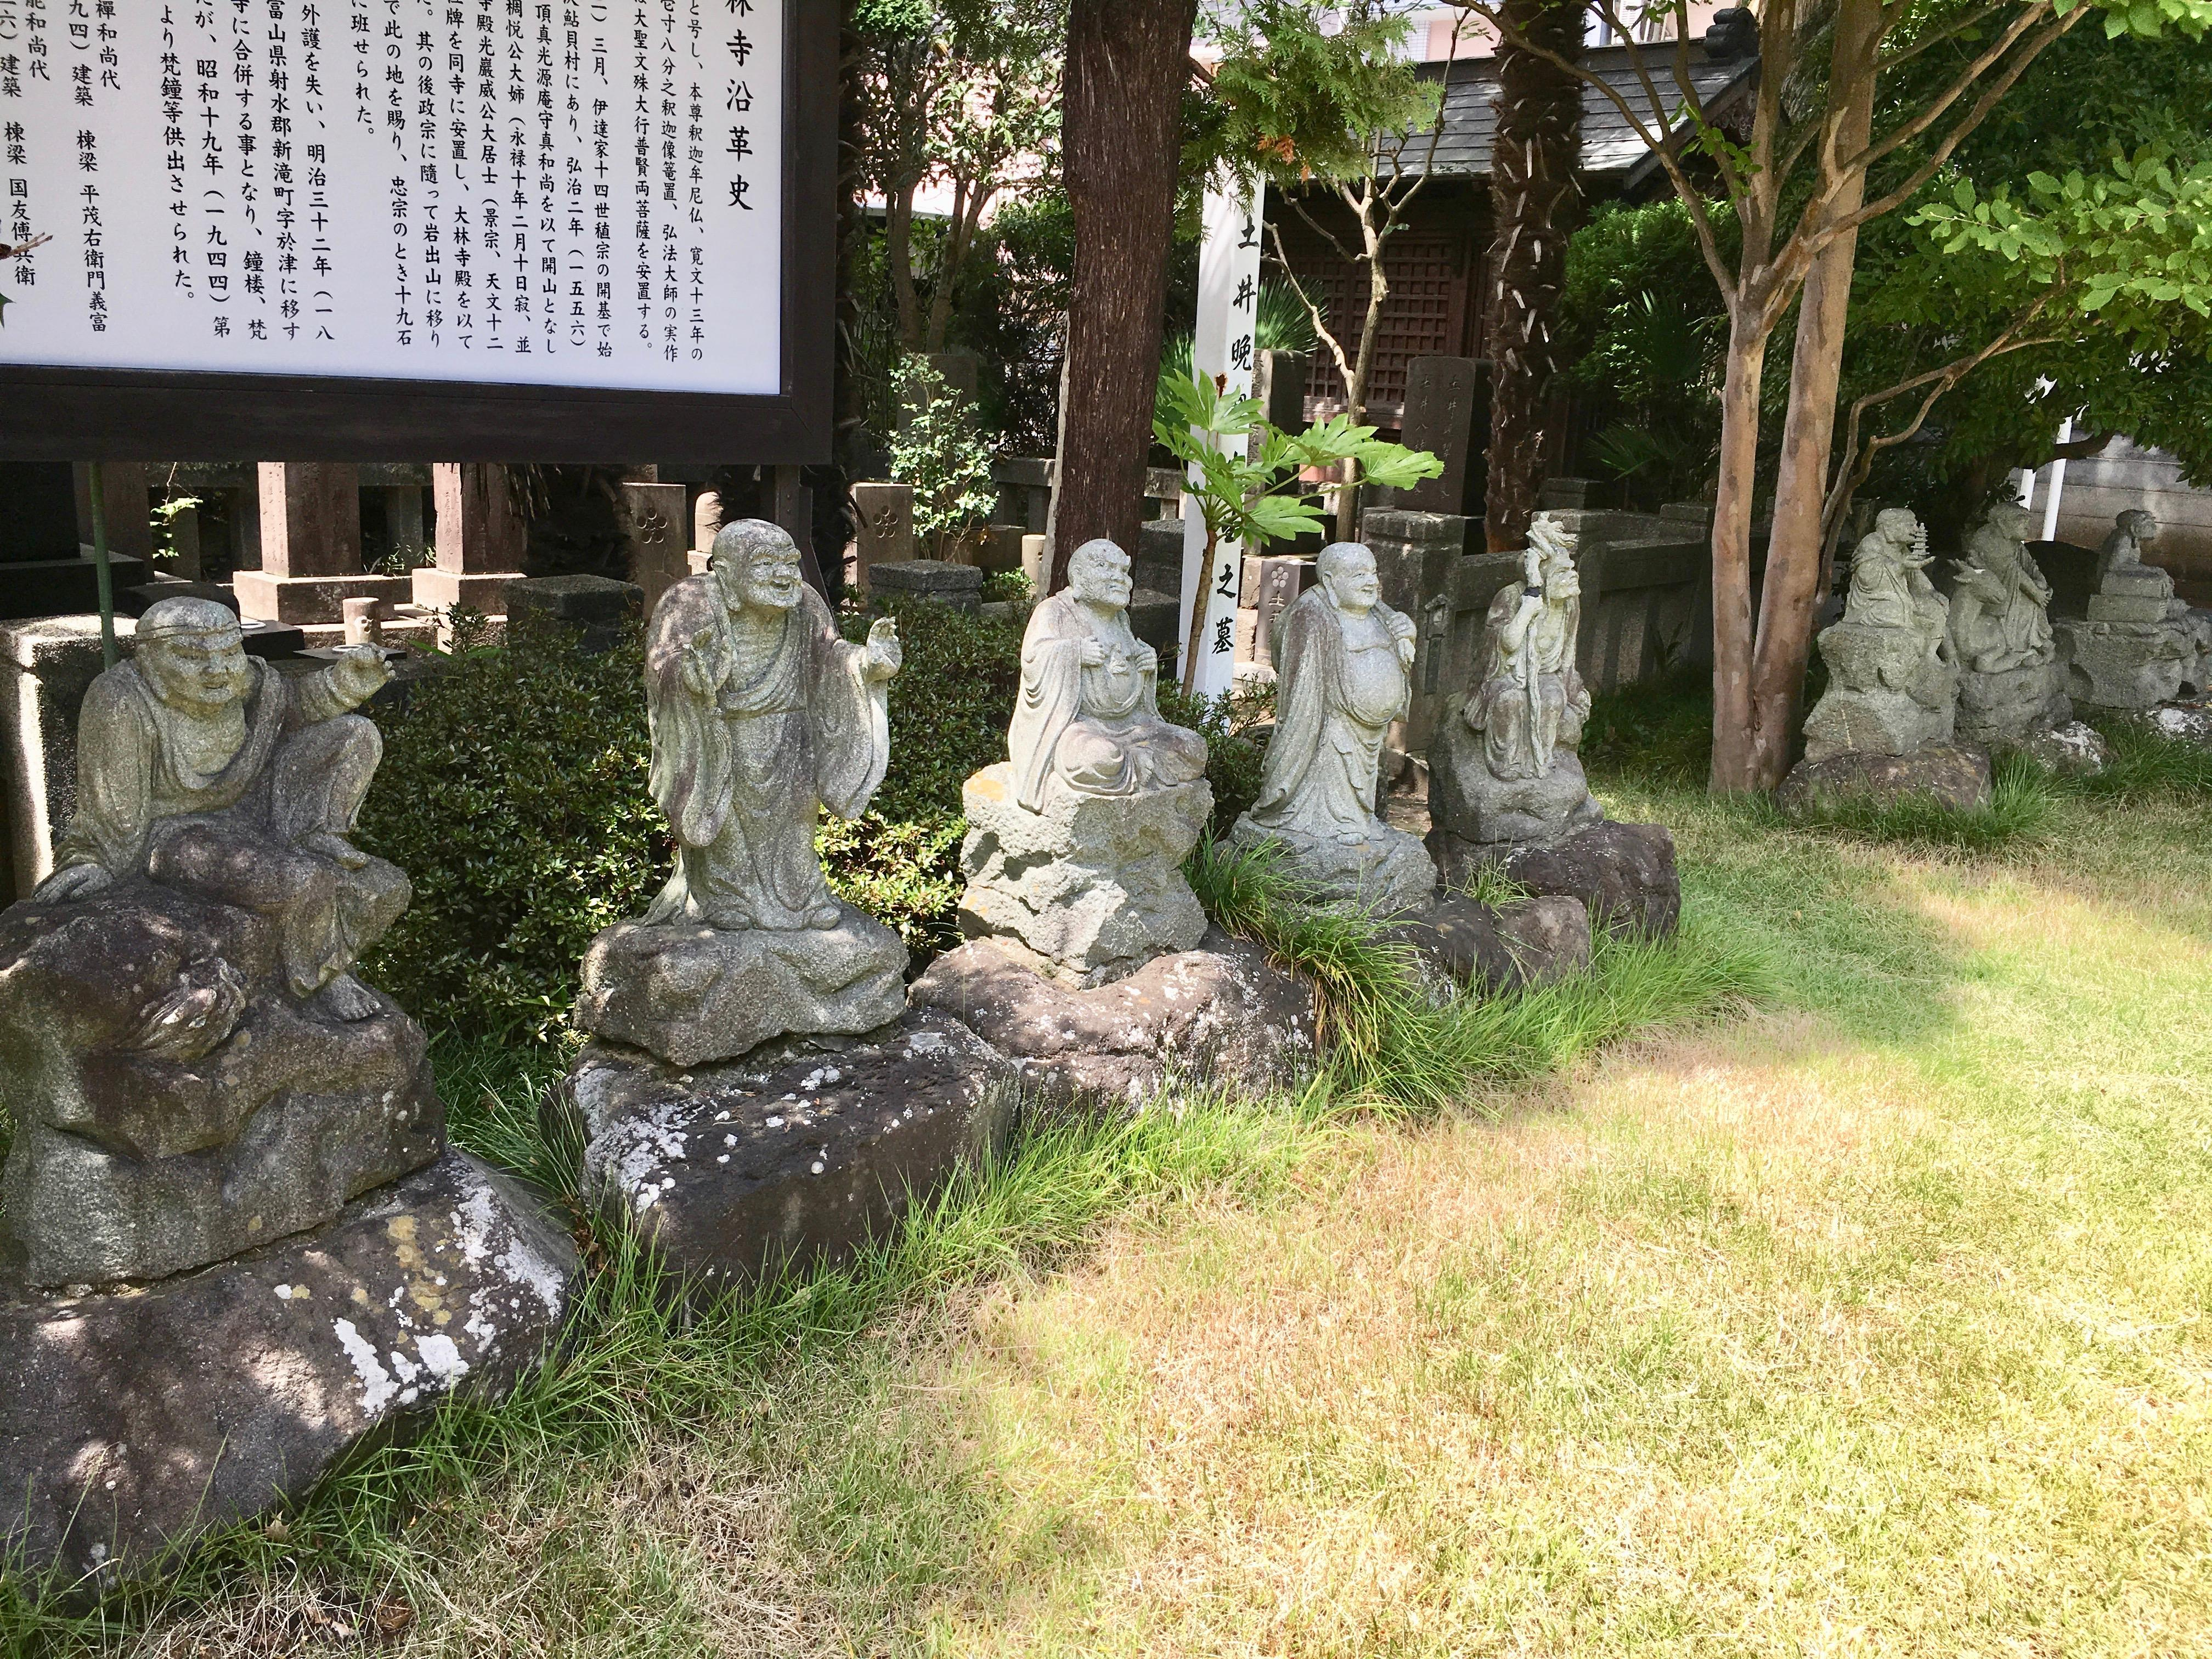 大林寺の像(宮城県榴ケ岡駅)